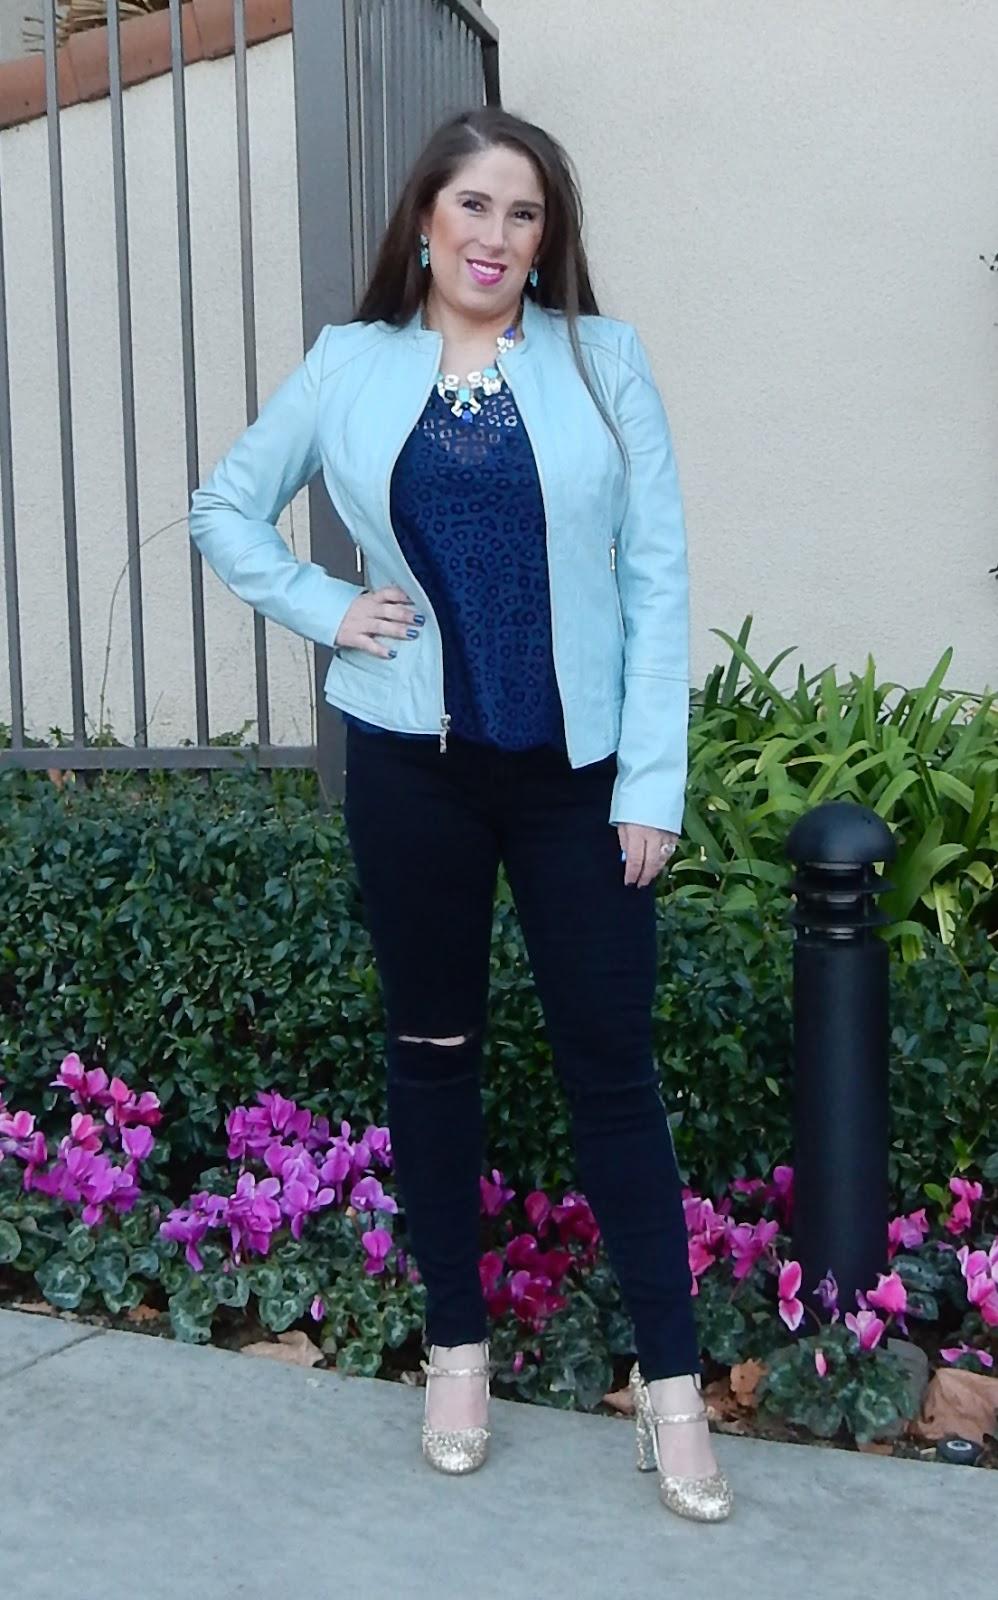 Marisa Stewart High Heeled Brunette Neiman Marcus Leather Jacket J Brand Jeans